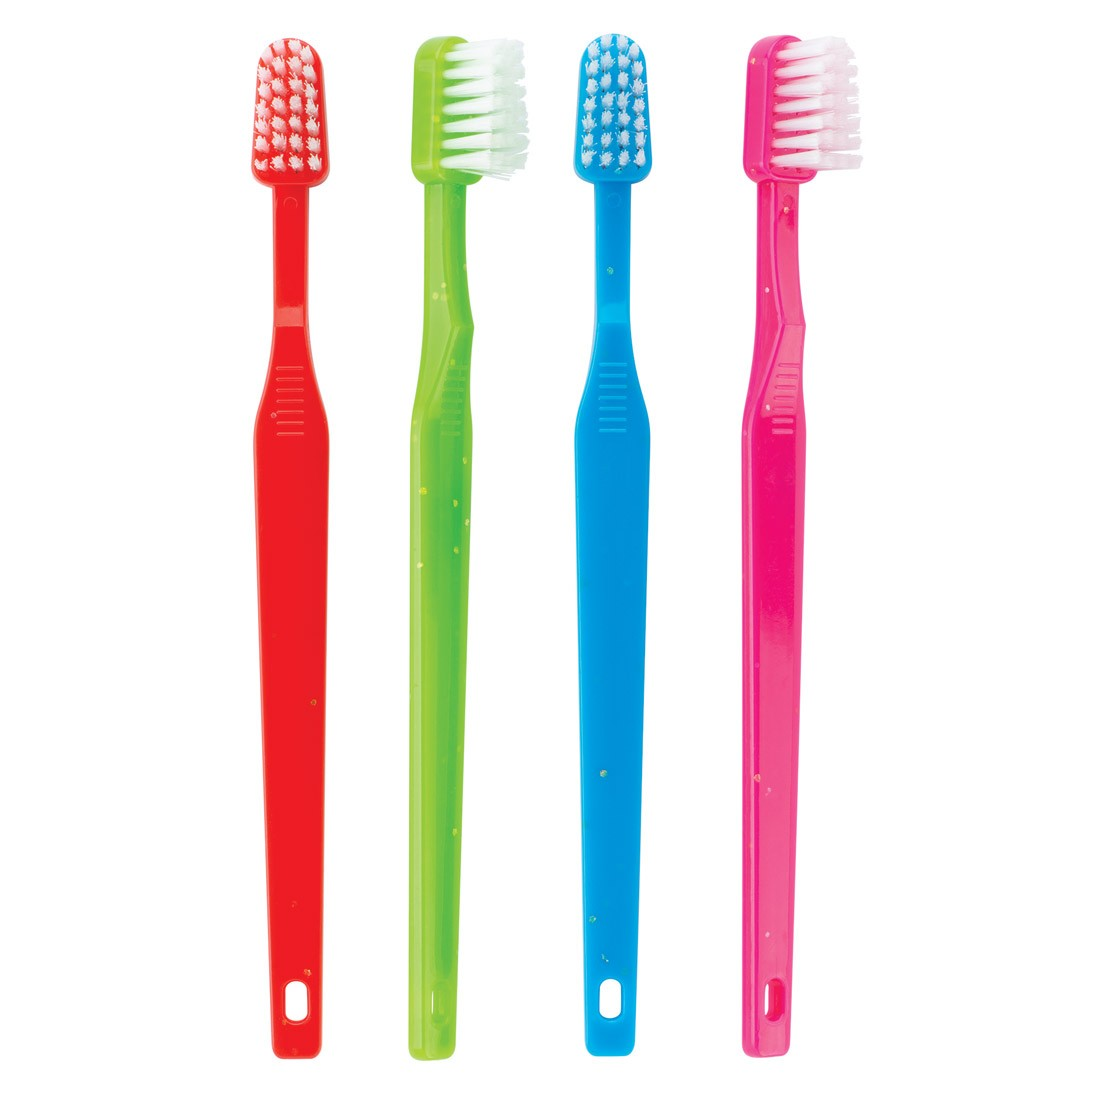 OraLine Toddler Sparkle Toothbrushes [image]